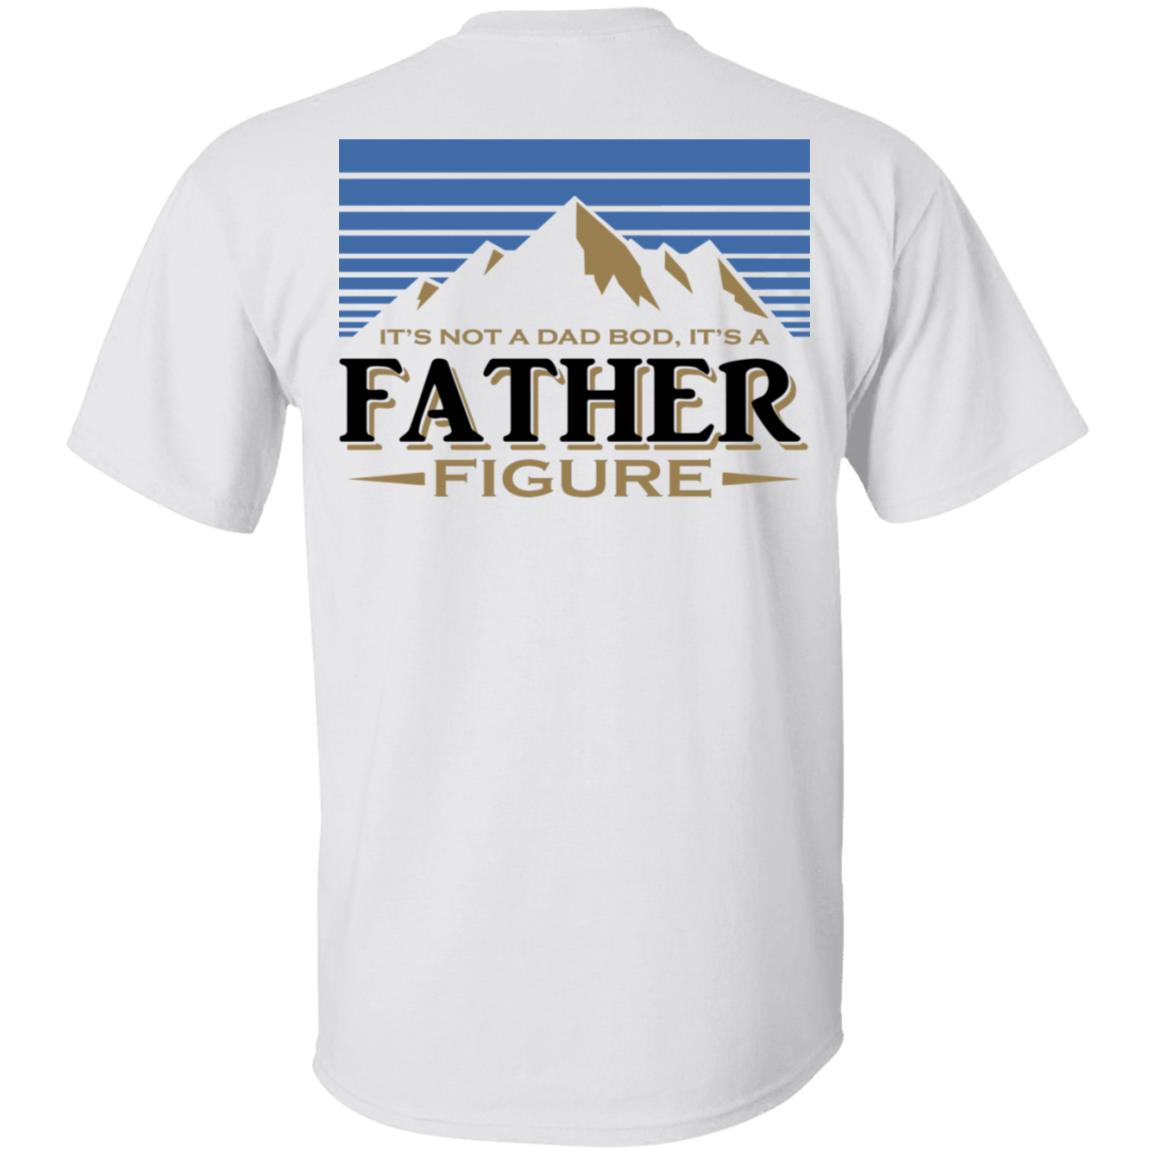 Busch Light Mountains It's Not A Dad Bod It's A Father Figure Shirt